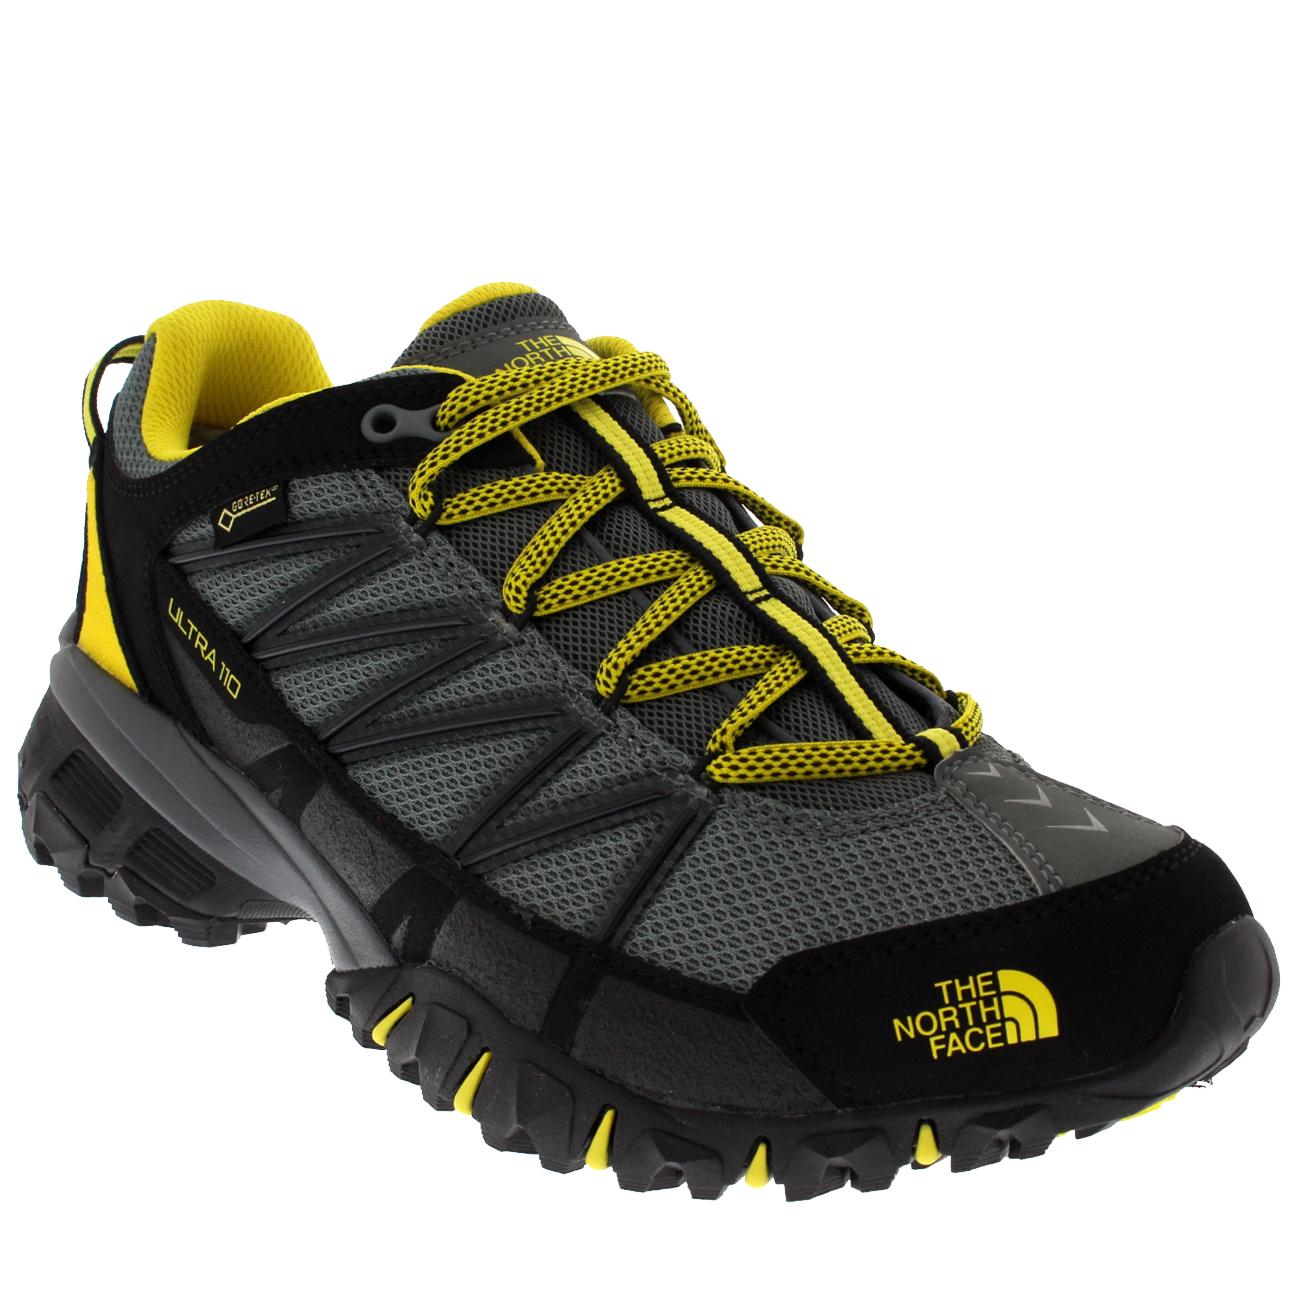 Ebay Mens Trail Running Shoes